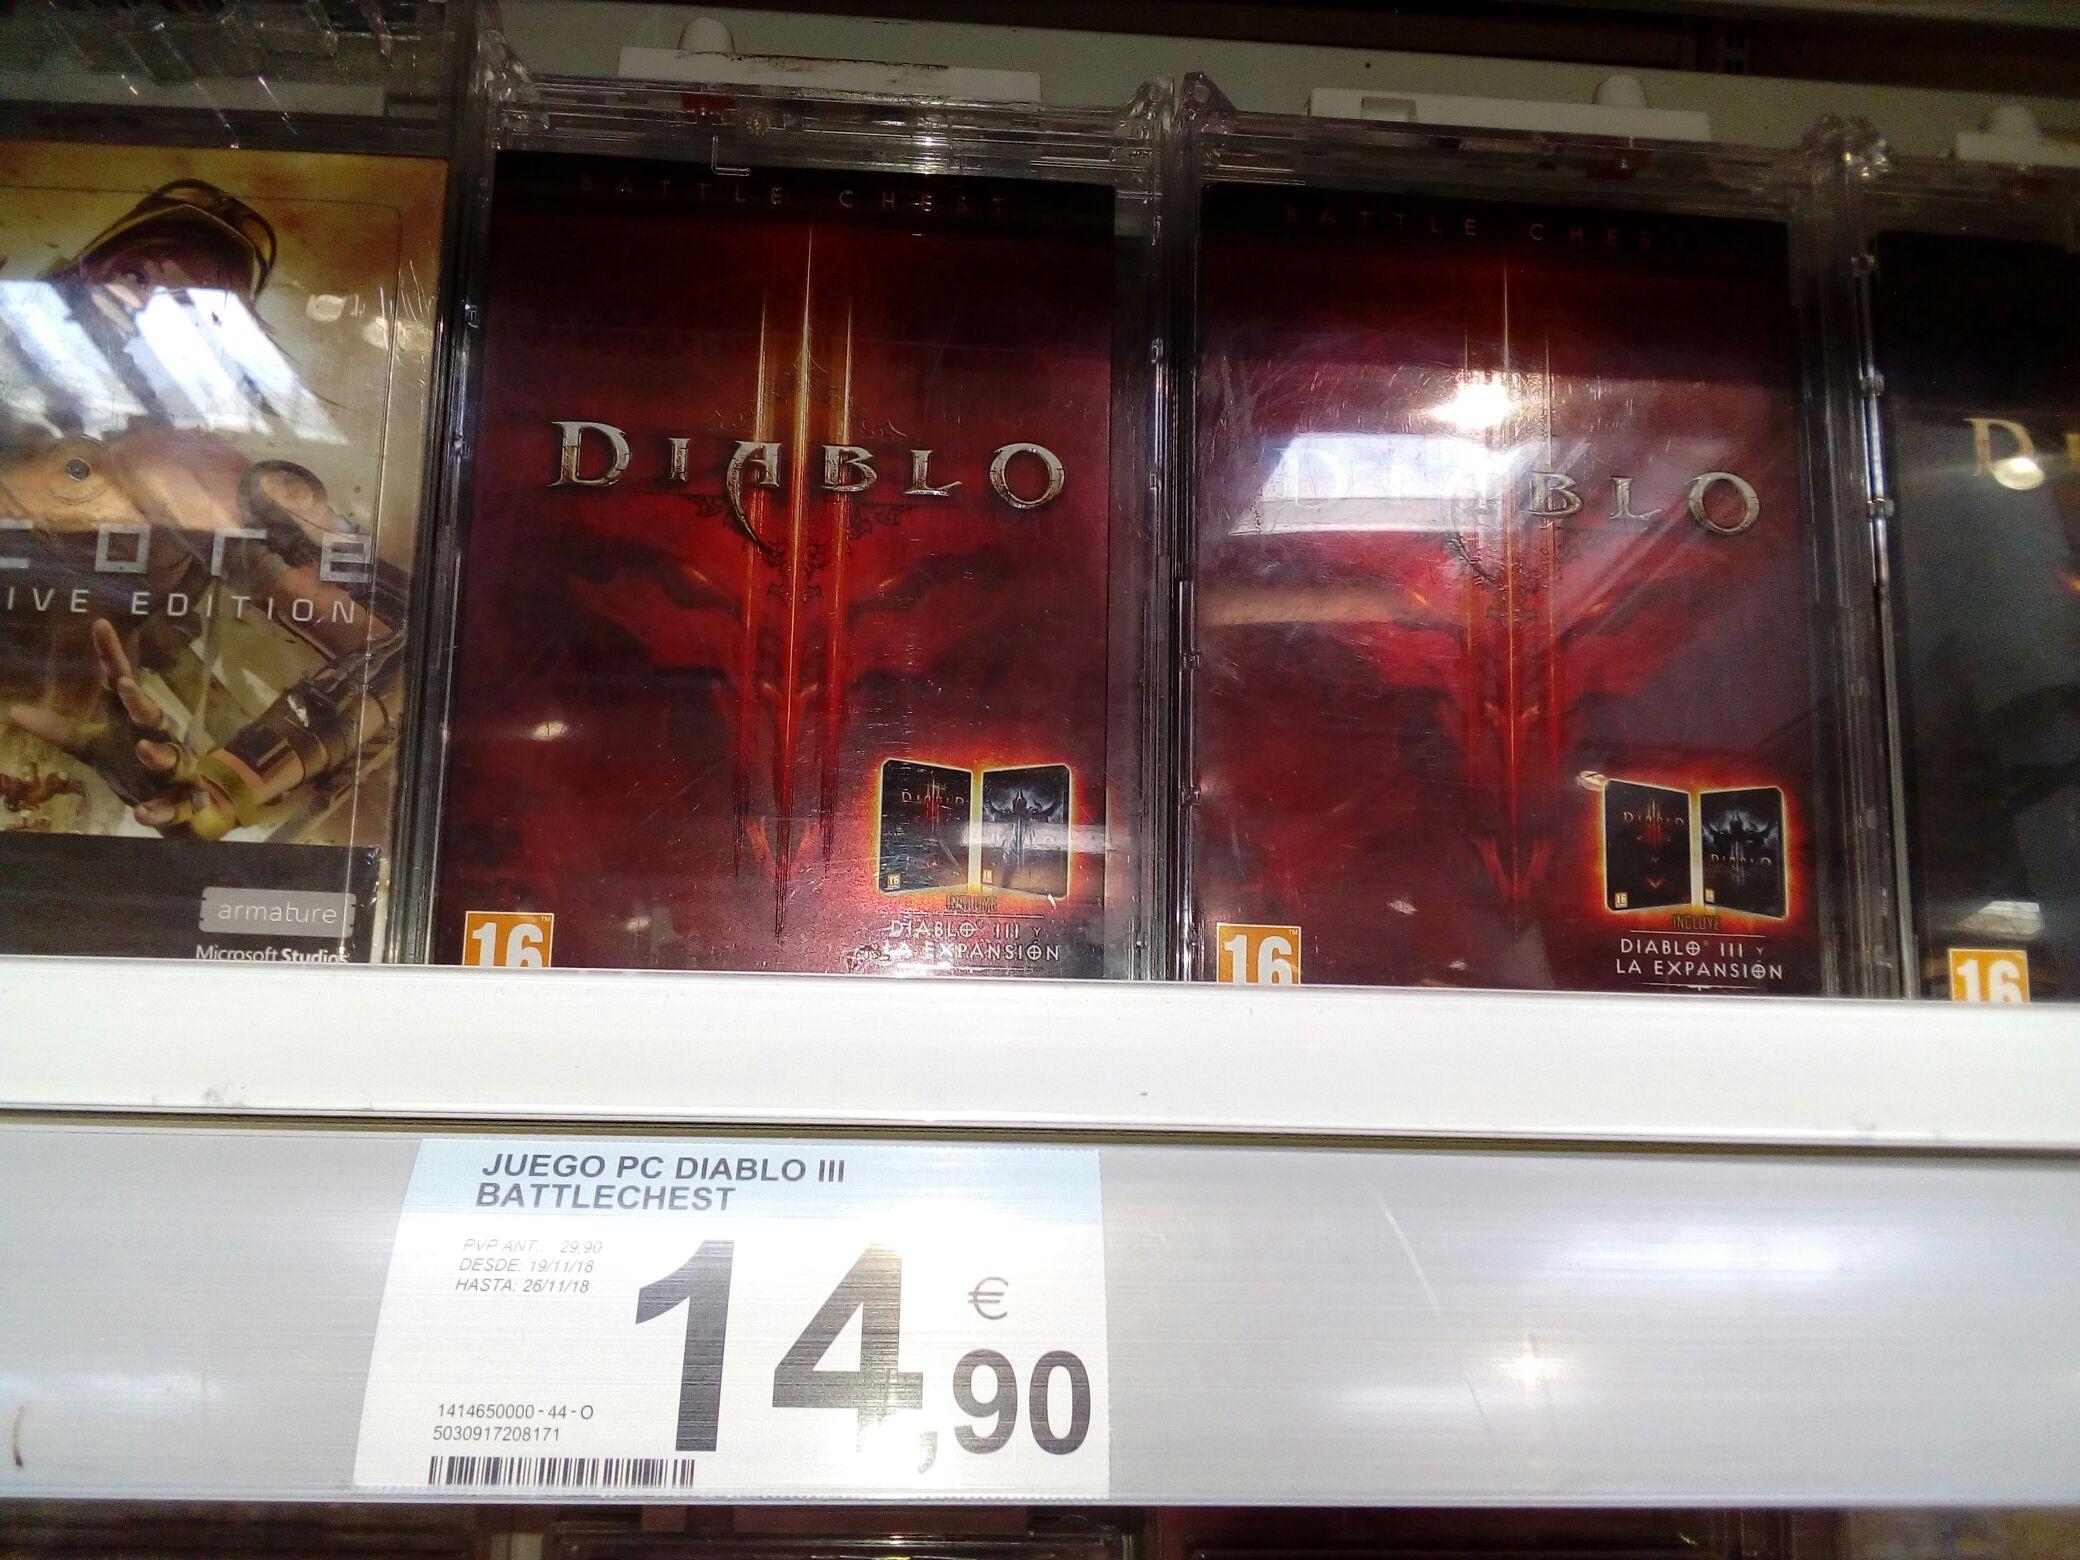 Diablo III + Reaper of Souls por 15 eurillos en Carrefour Finestrat